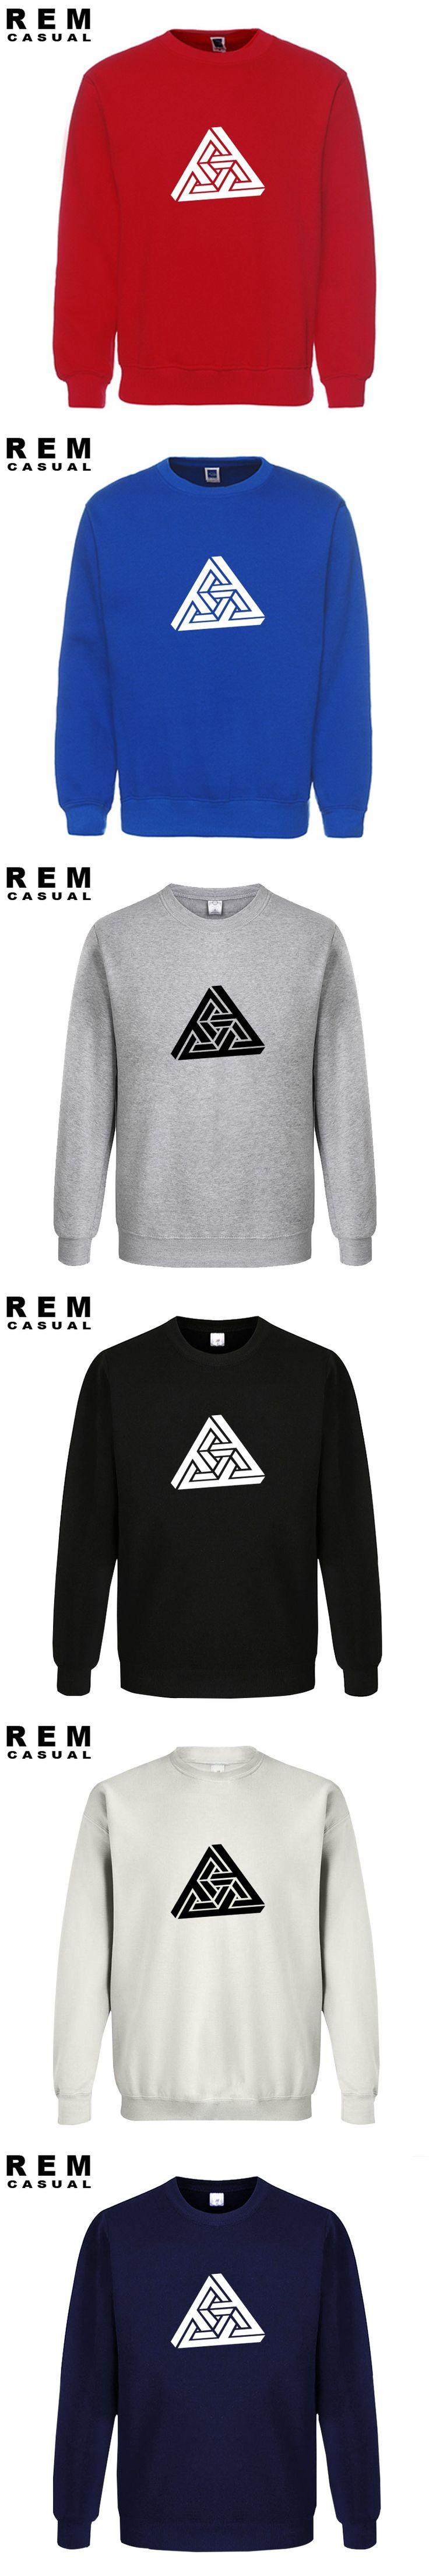 Necker cube Geometric funny 2016 new design men long sleeve homme Hoodies, Sweatshirts